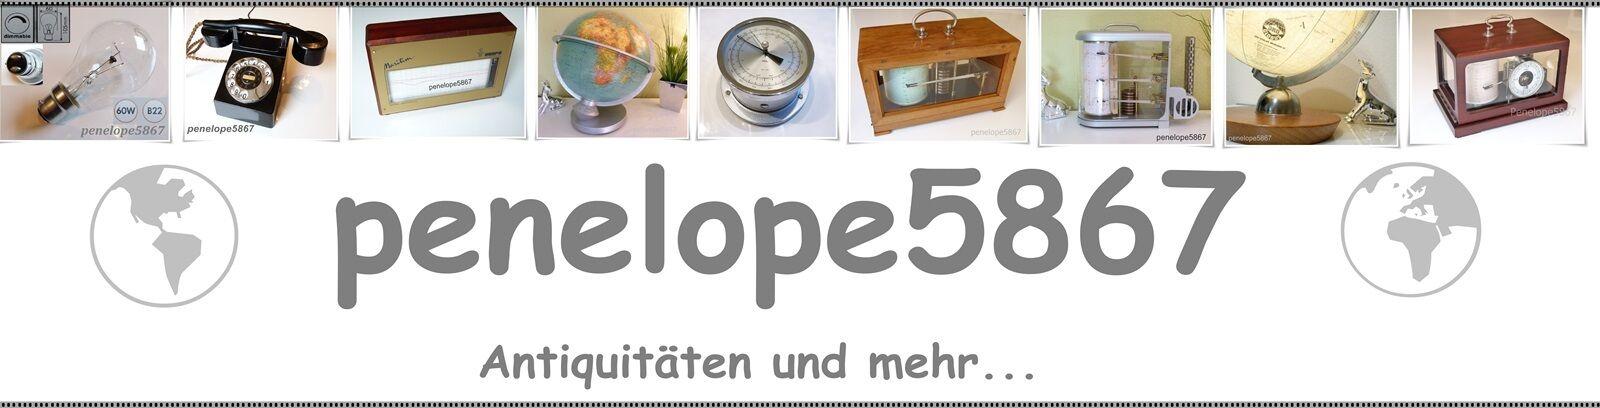 Online-Shop-penelope5867